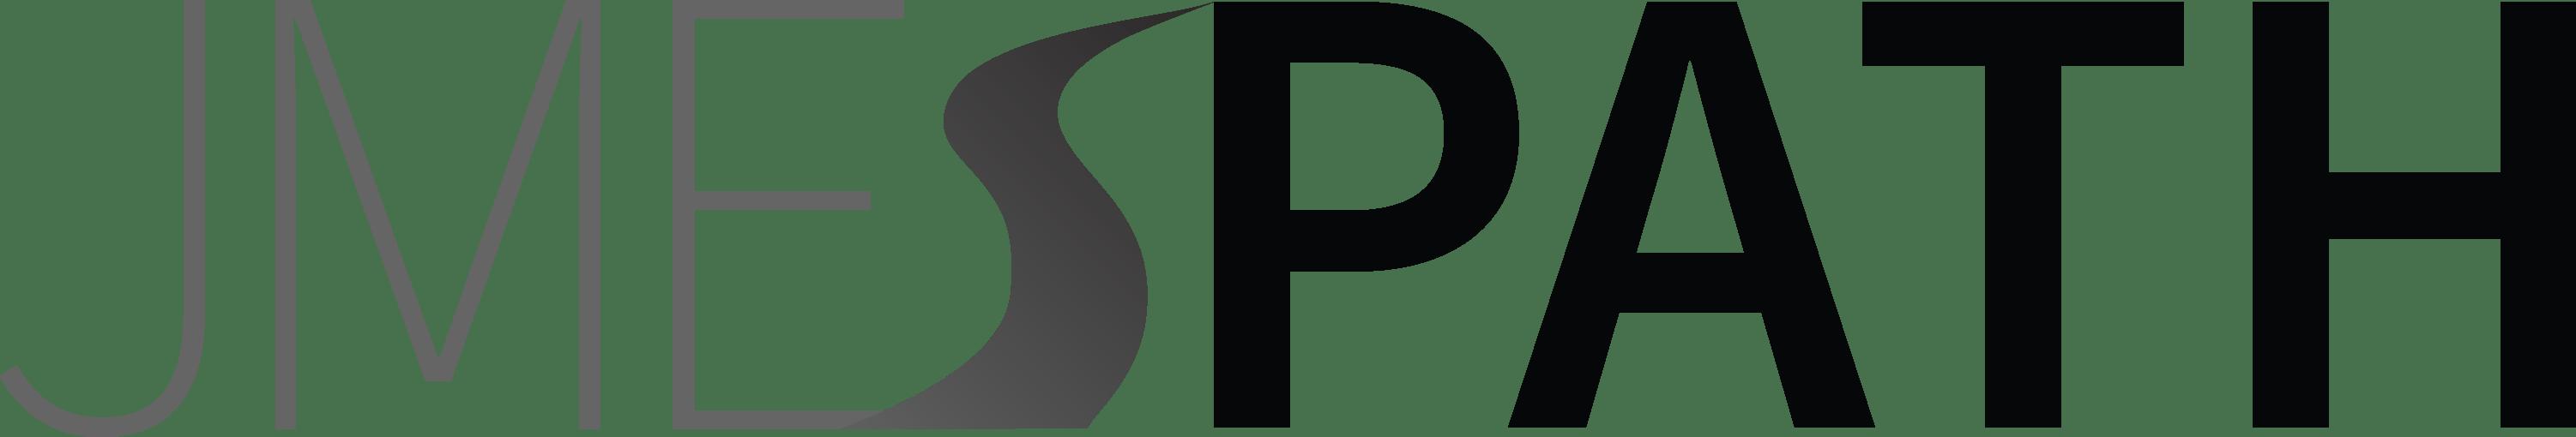 JMESpath Python